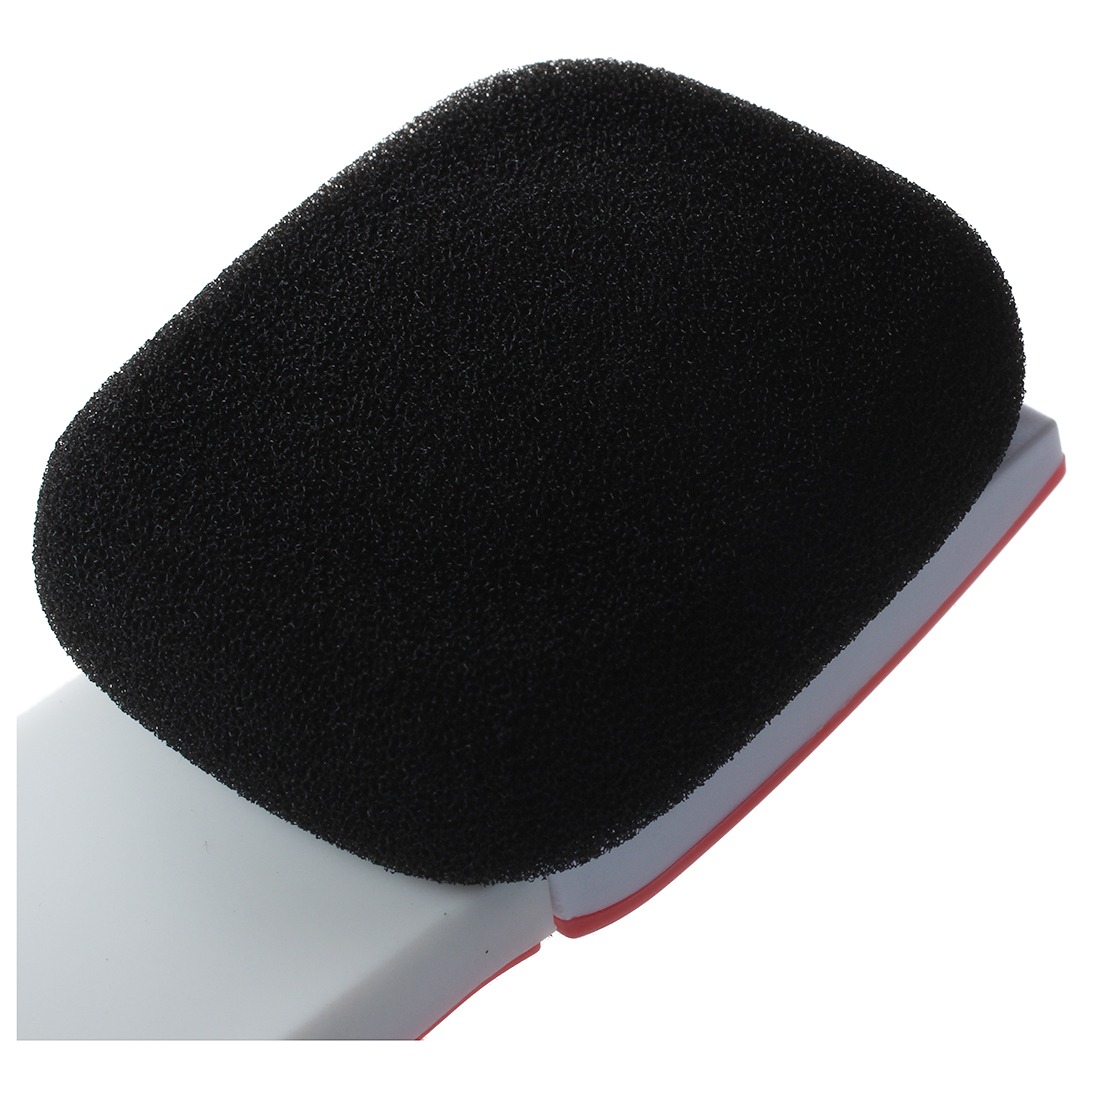 m9 2 4ghz wireless bluetooth 3 0 headset kopfhoerer fuer. Black Bedroom Furniture Sets. Home Design Ideas